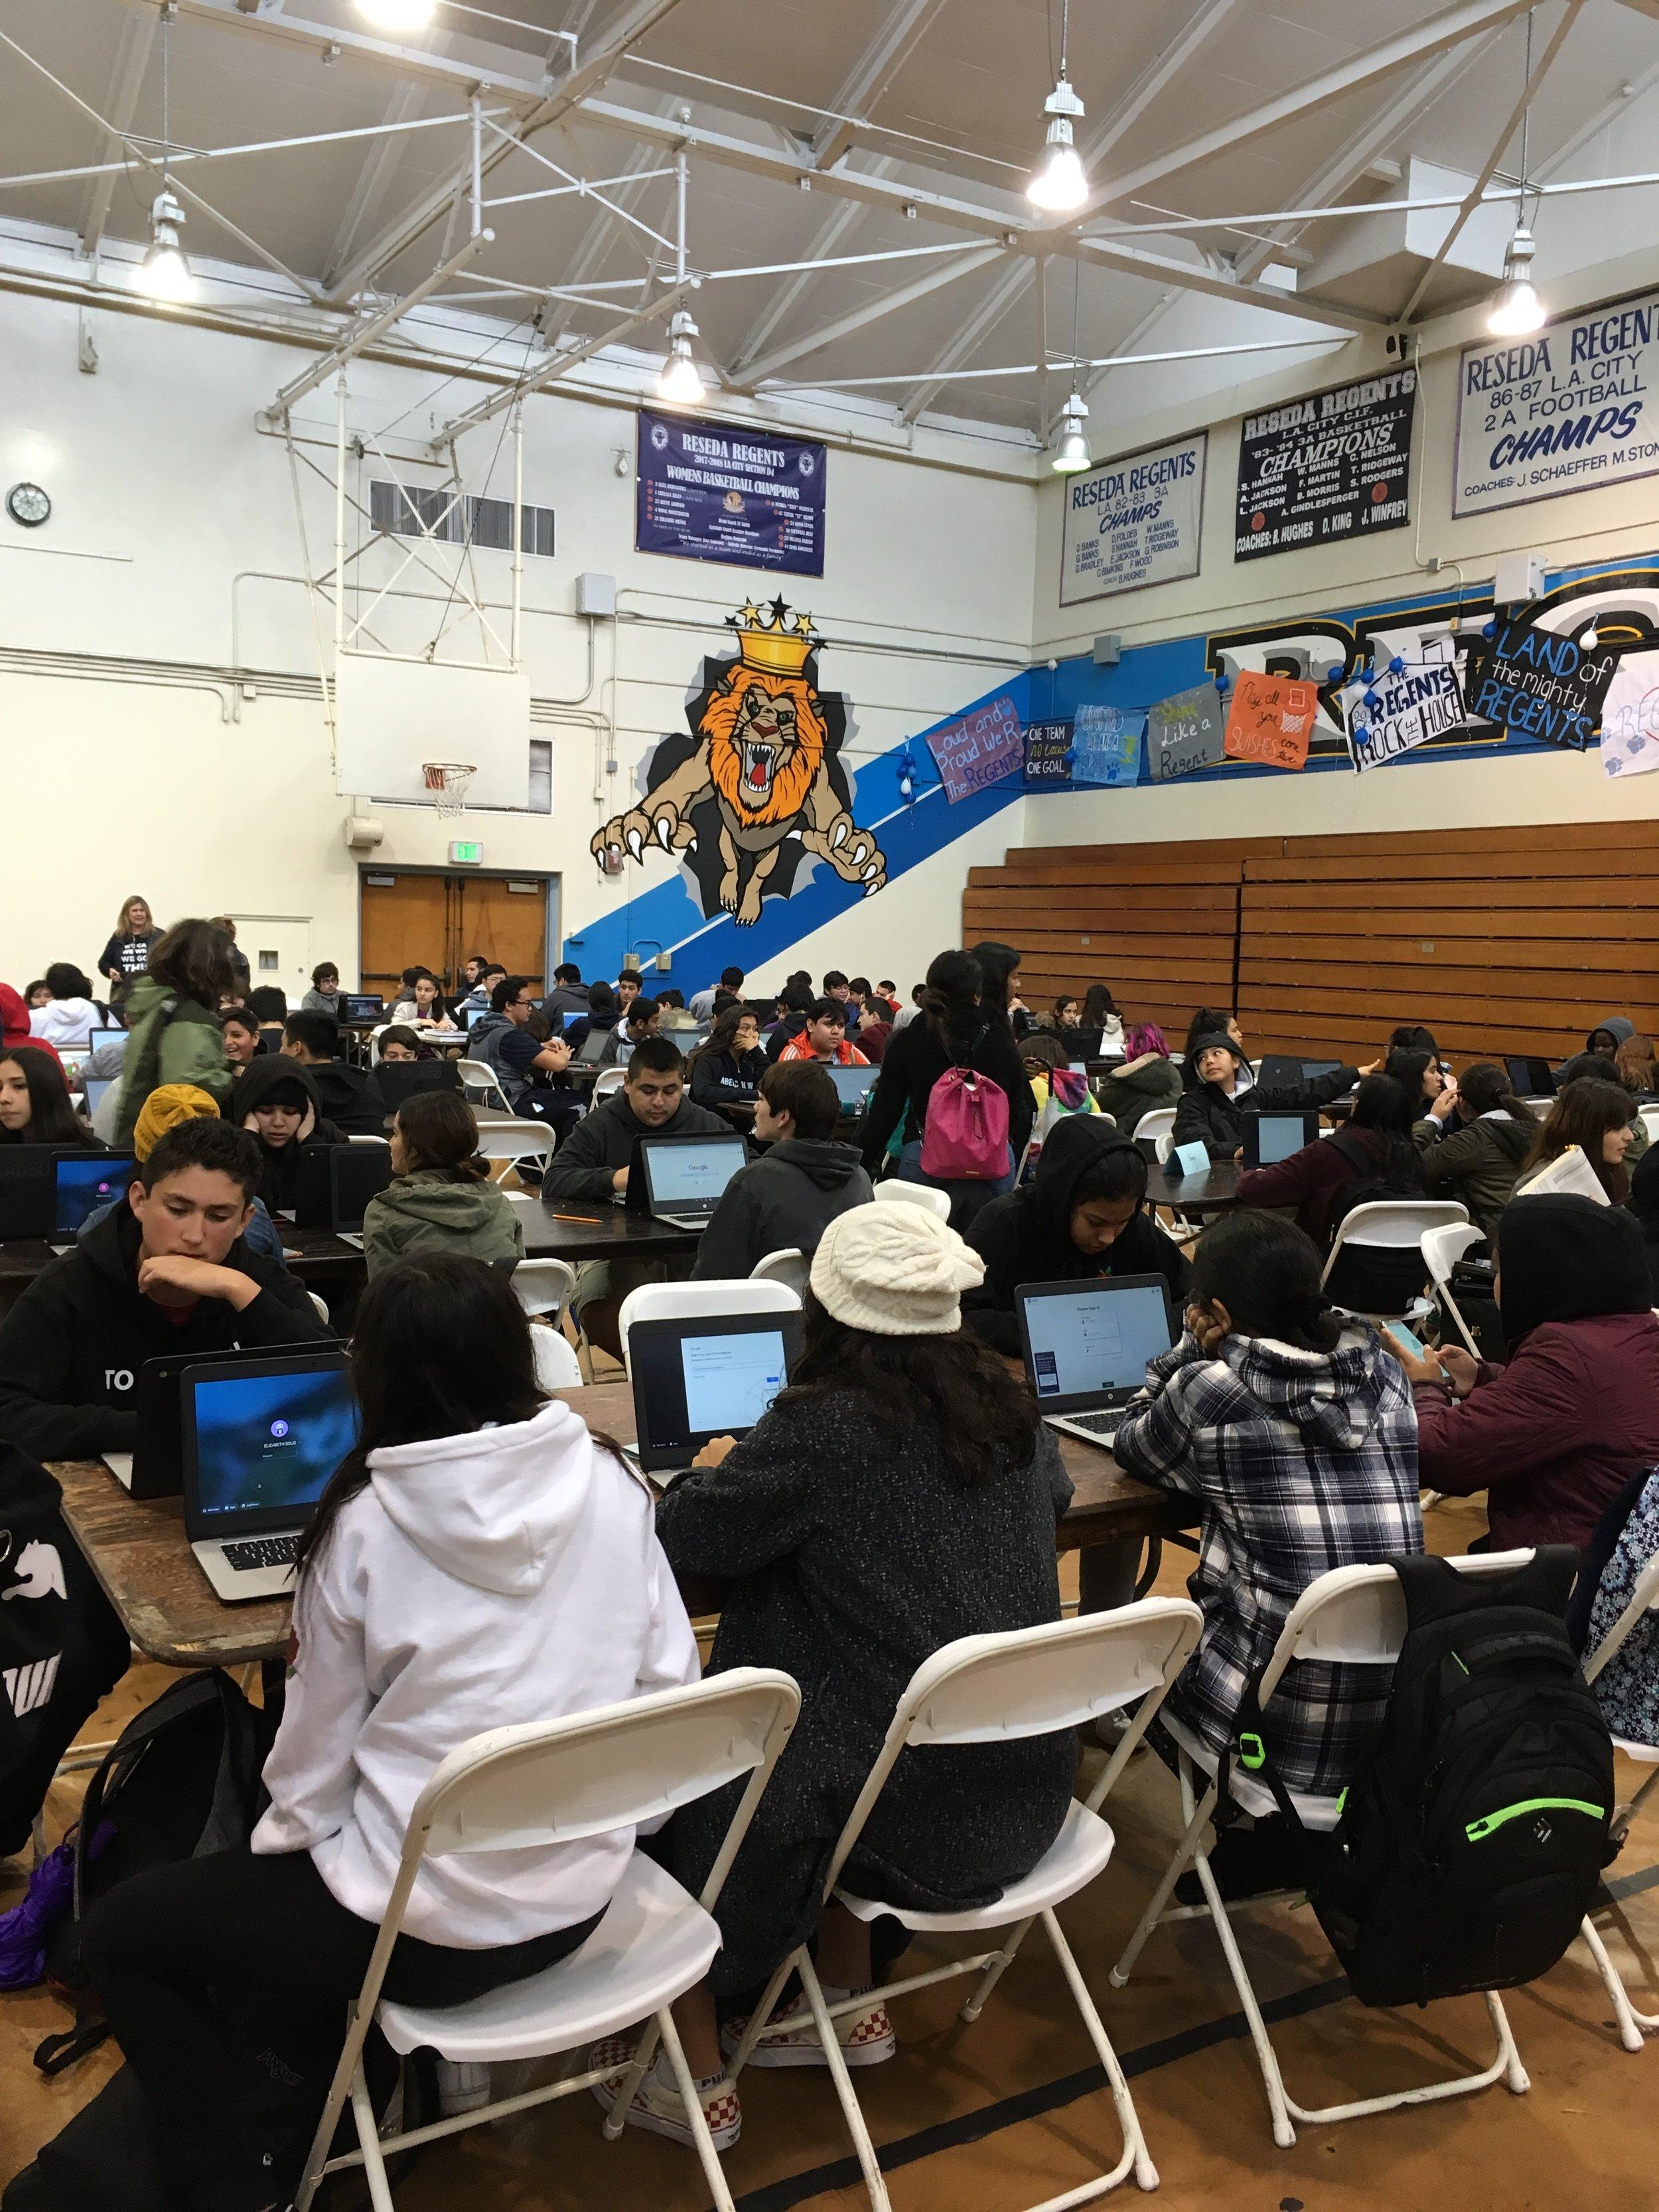 Students at Reseda Charter High